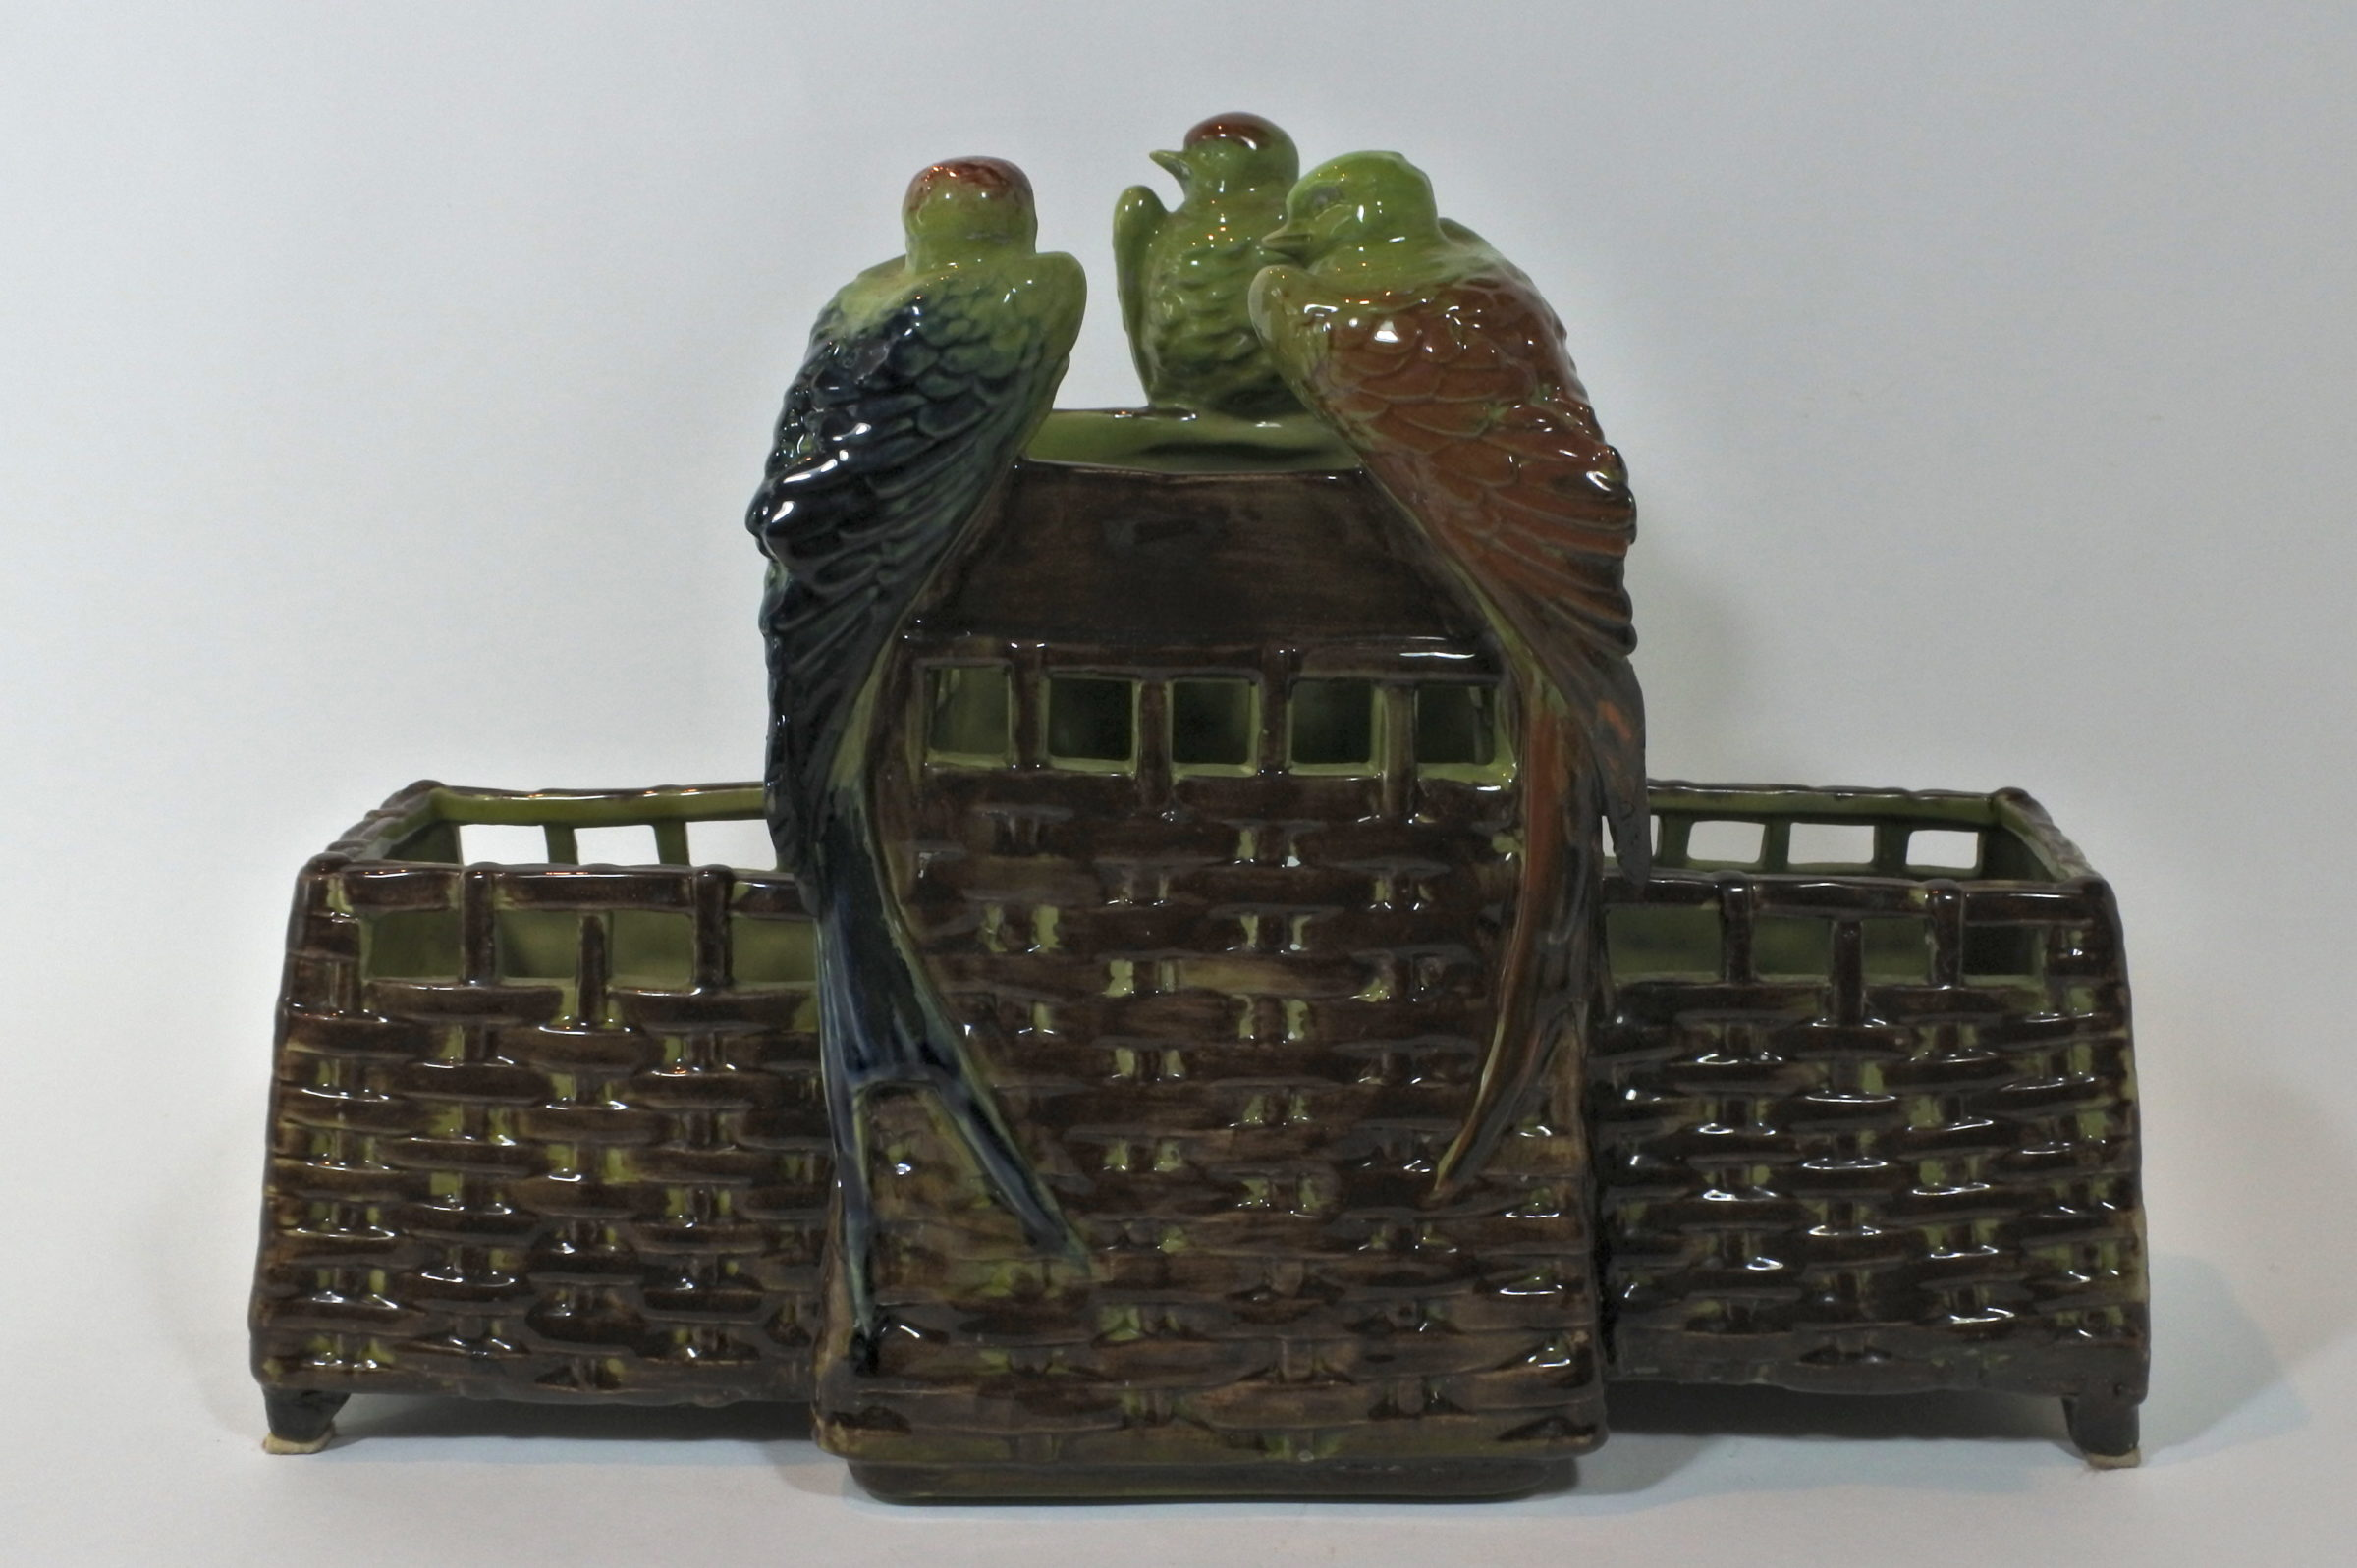 Jardinière in ceramica barbotine con uccellini